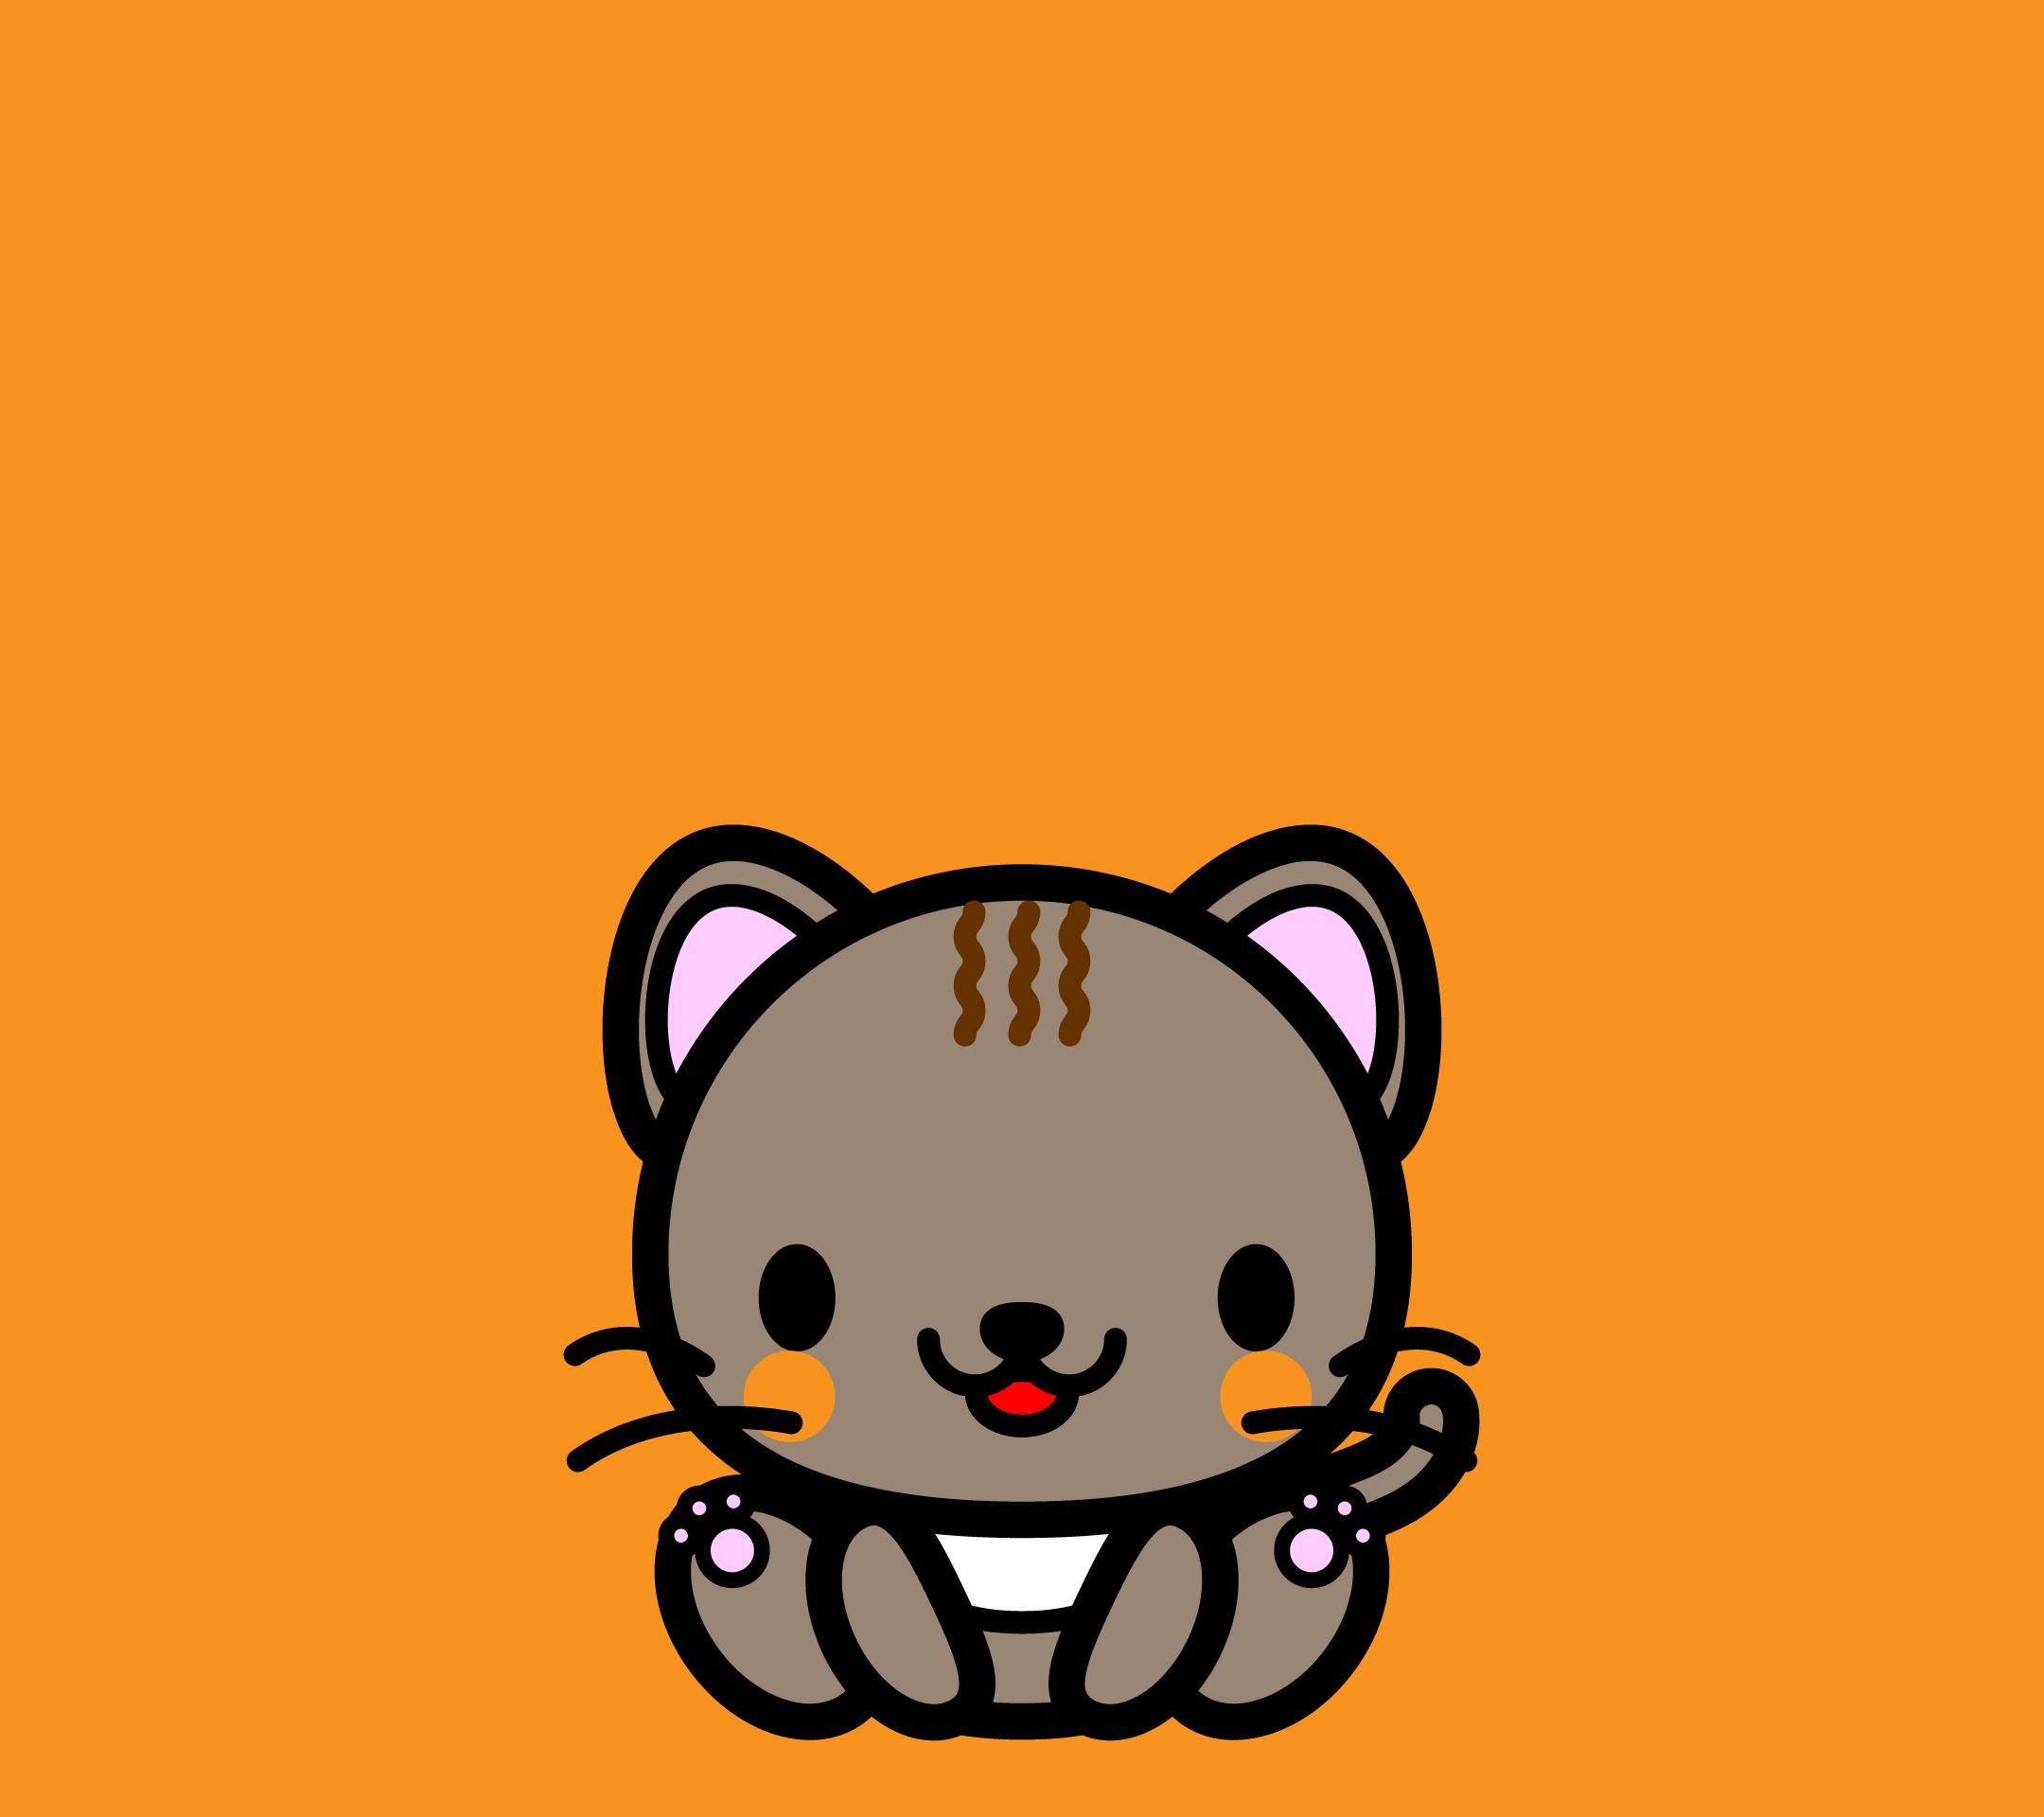 wallpaper1_sitcat-orange-android